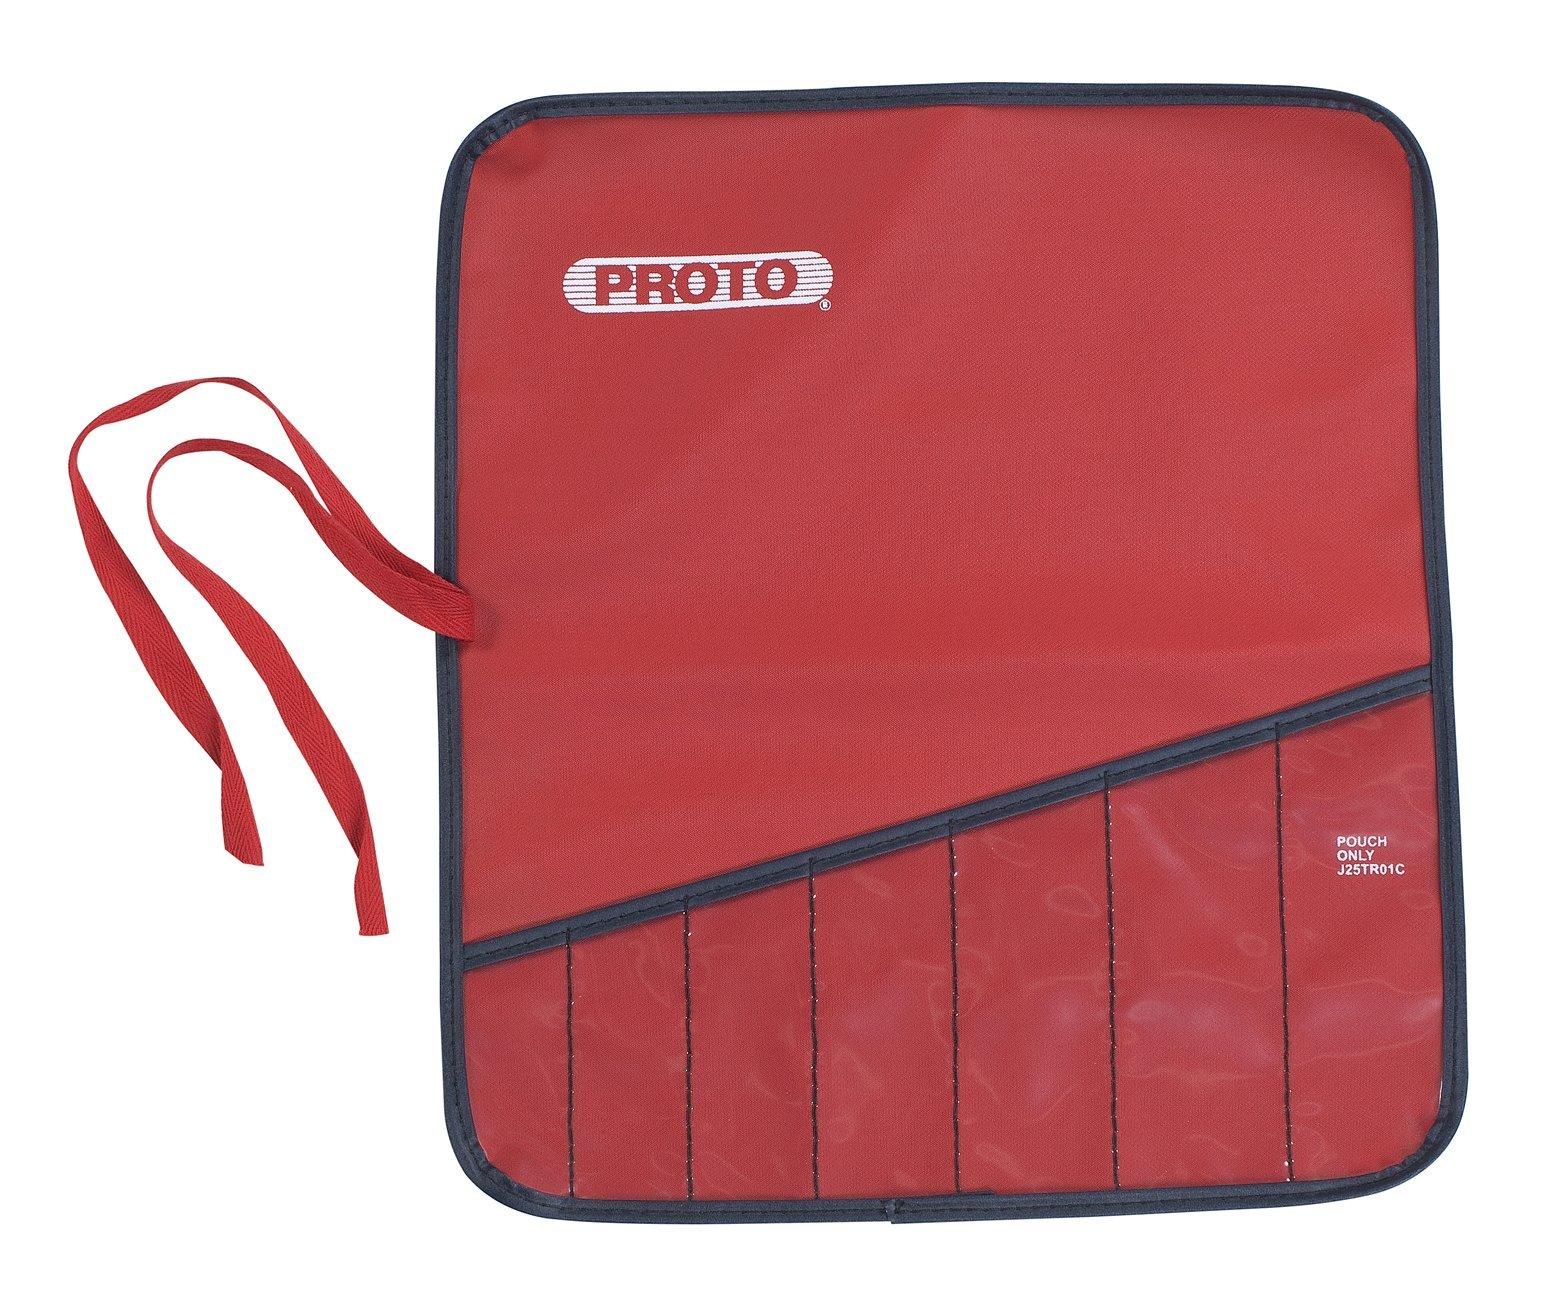 Stanley Proto J25TR31C Proto 7 Pocket Tool Roll